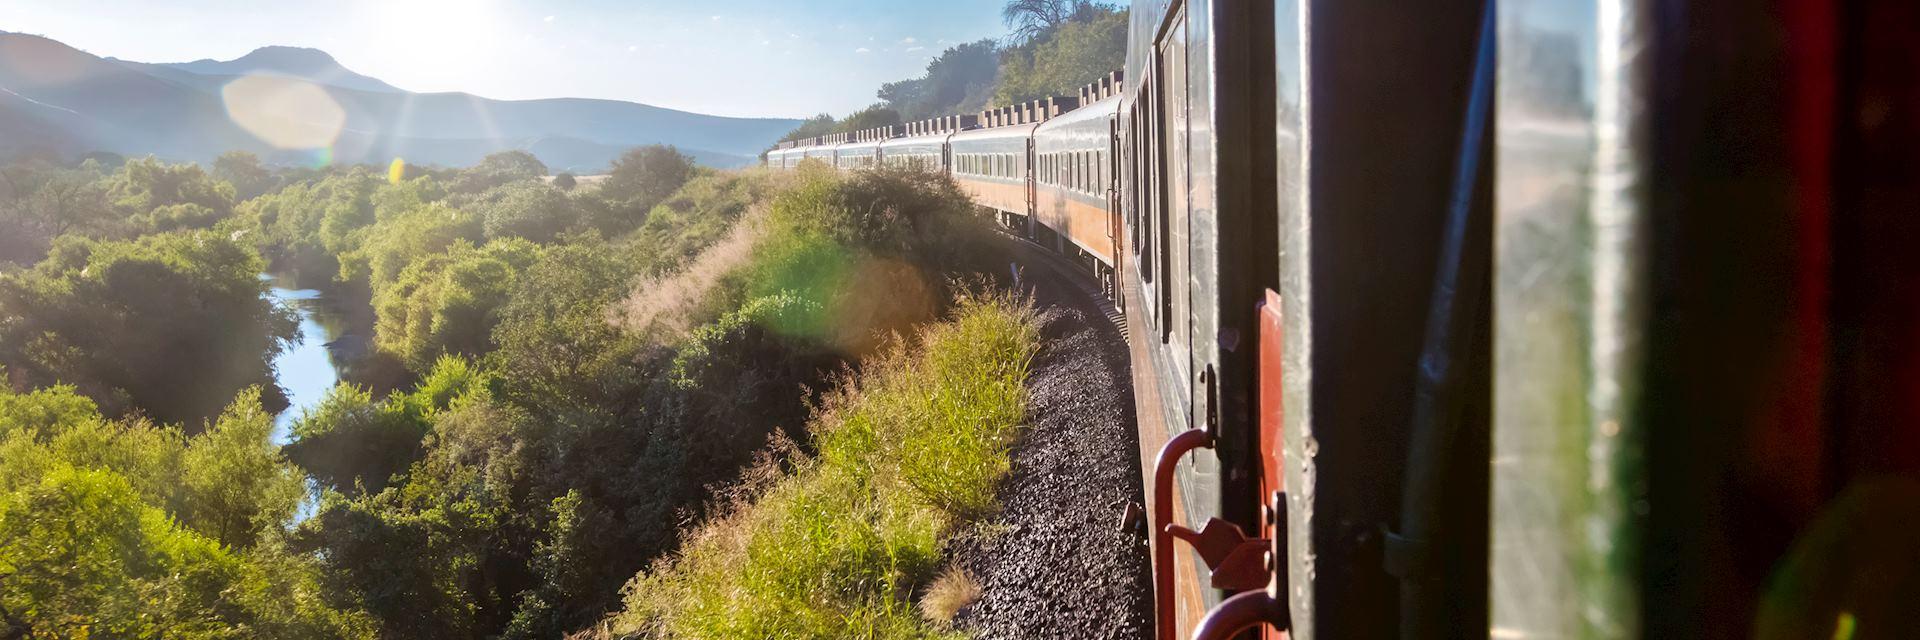 Chepe Train near Chihuahua